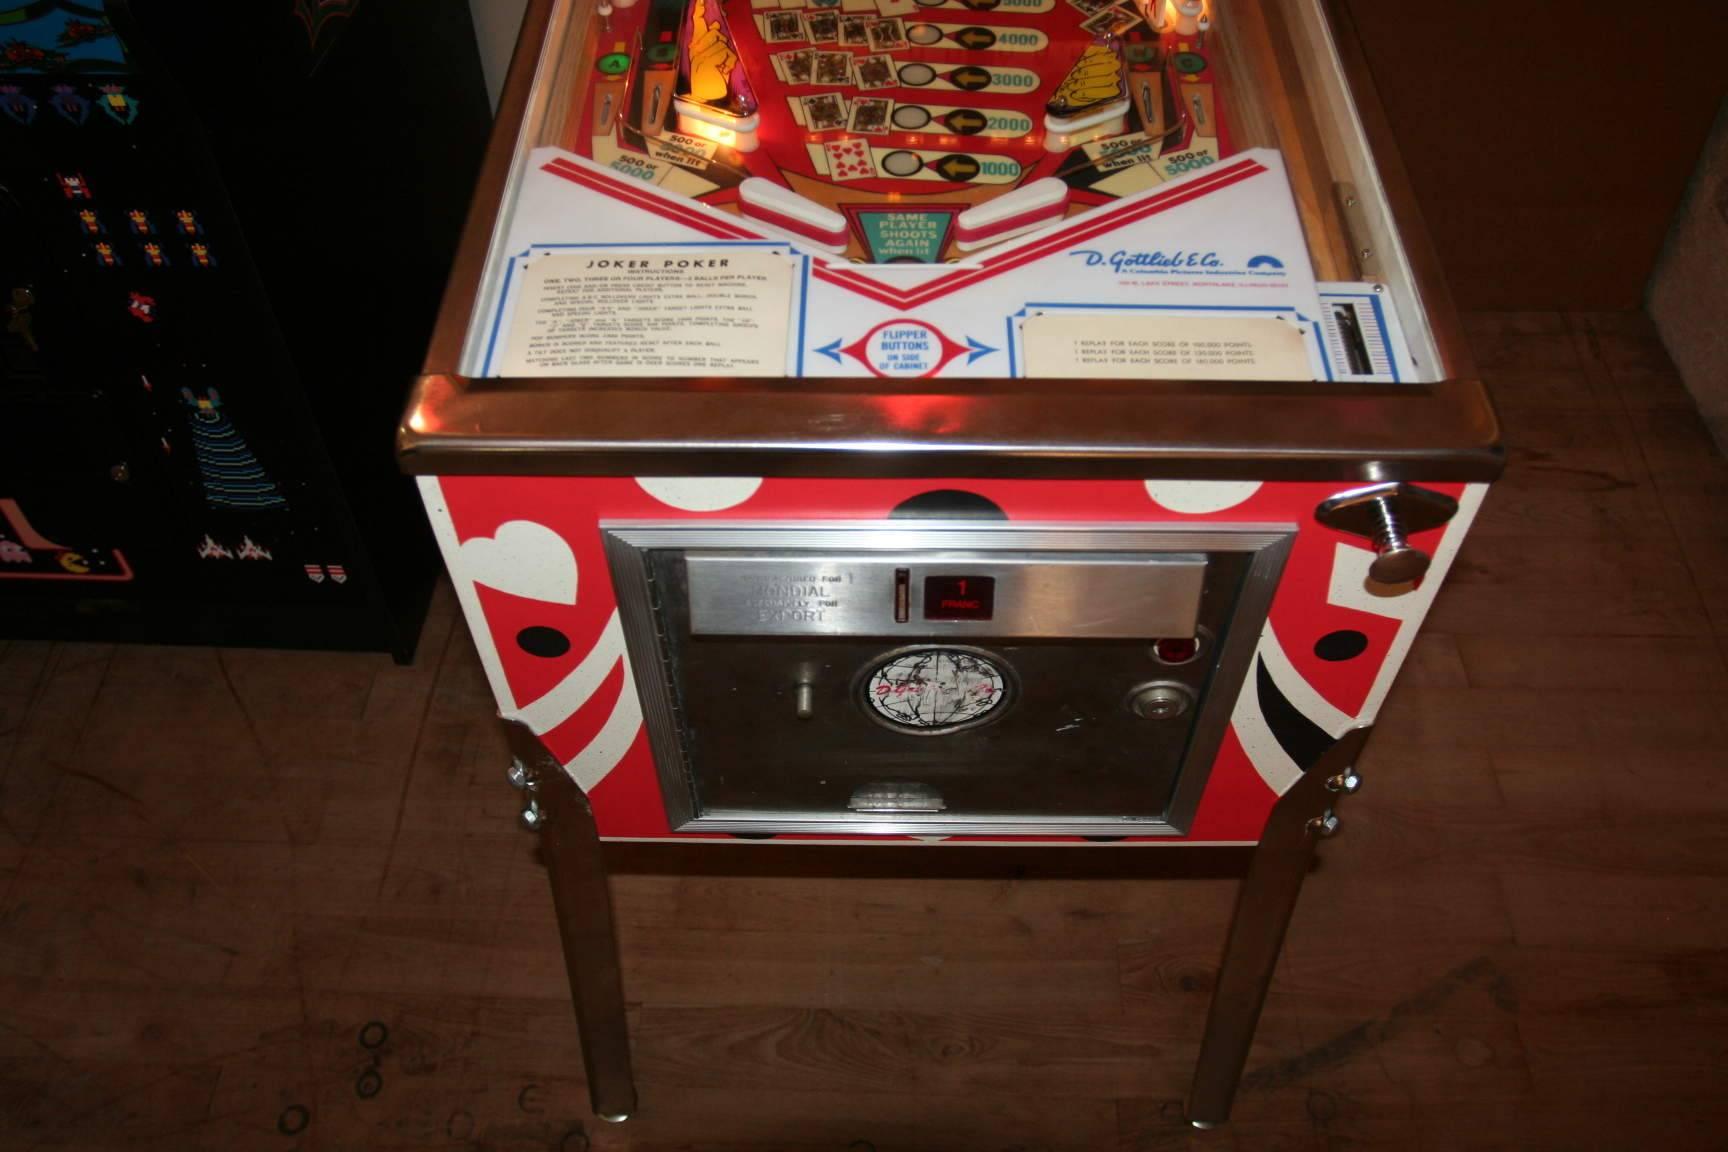 For Sale Restored Joker Poker Em Machine Pinball